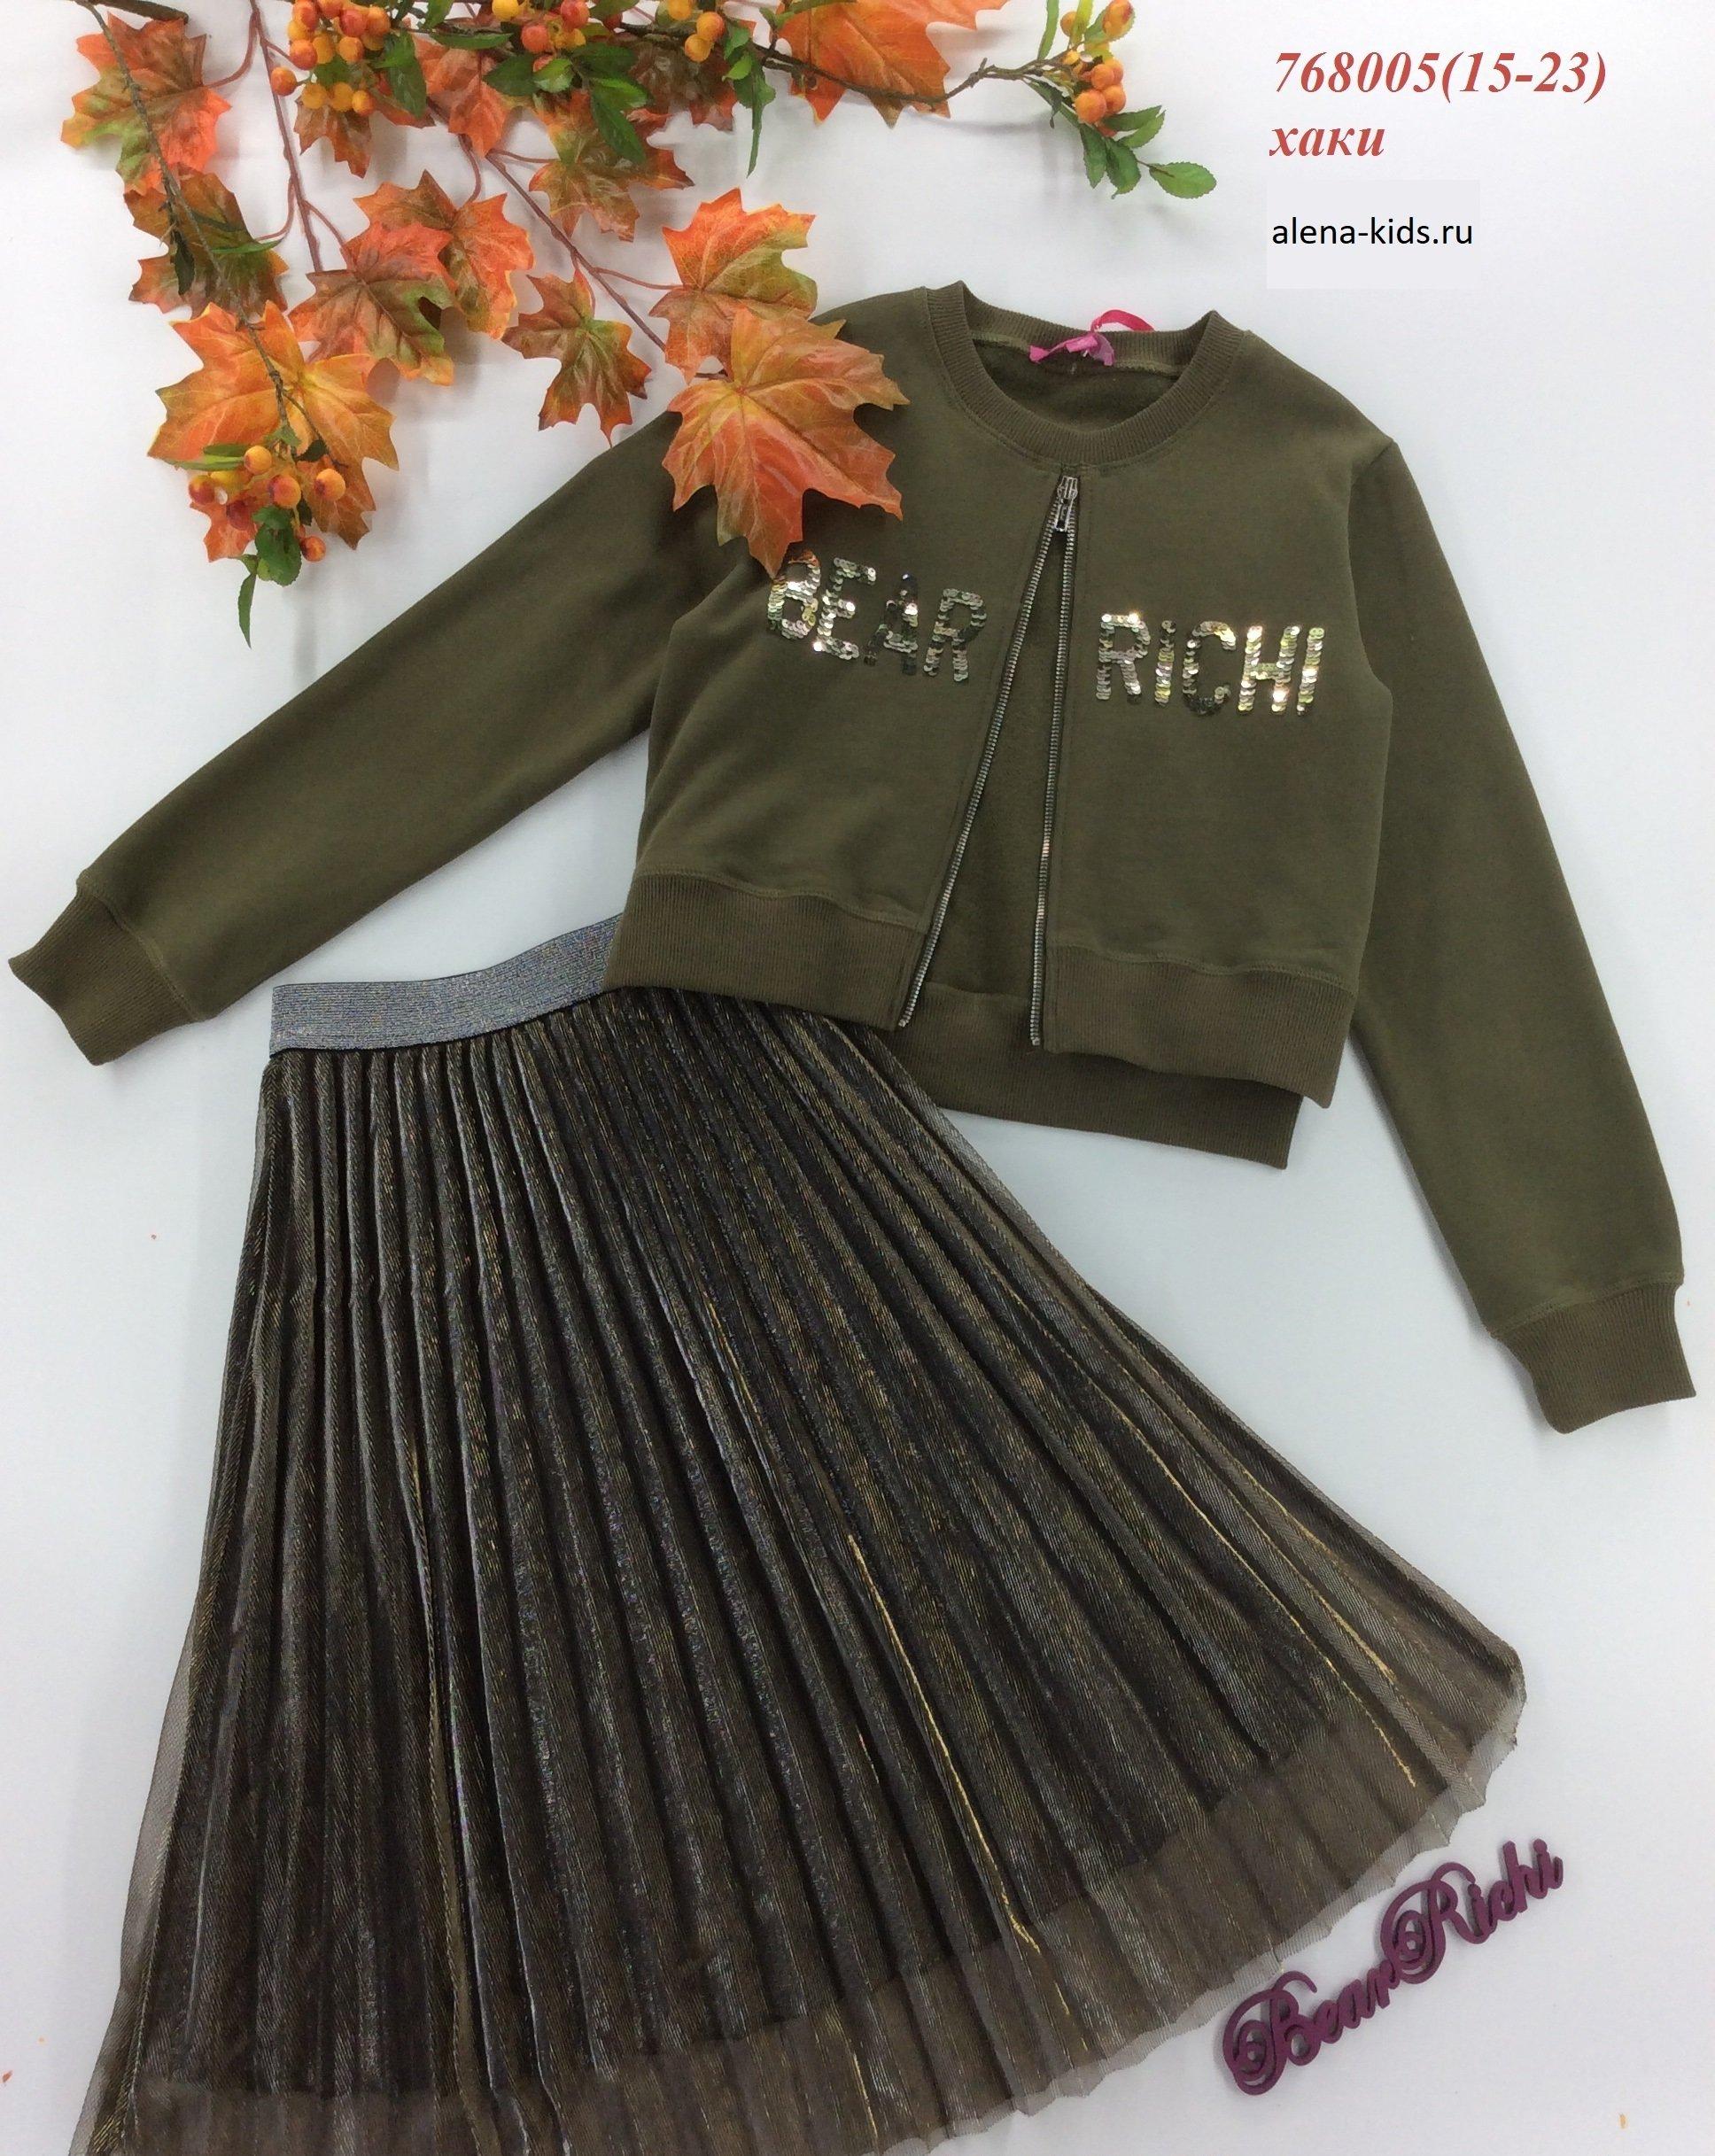 Кофта для девочки YGBH768005